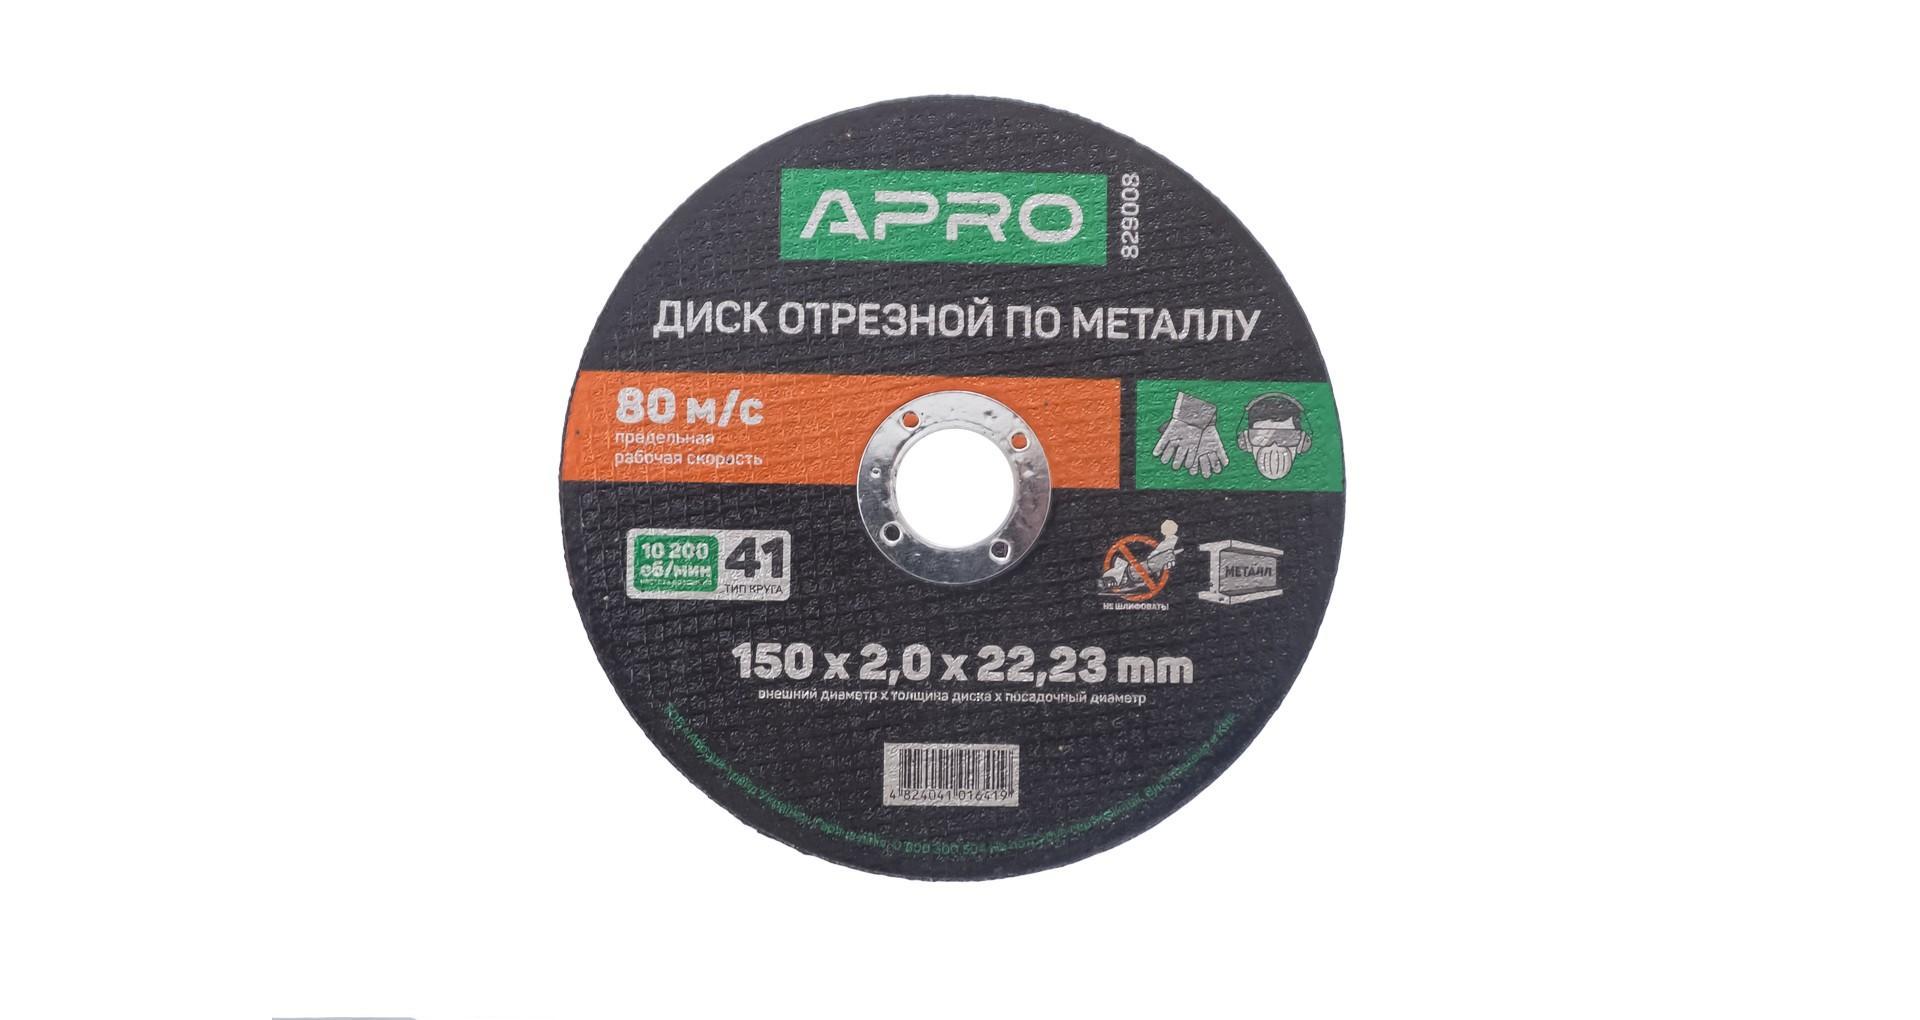 Диск отрезной по металлу Apro - 150 х 2,0 х 22,2 мм 3